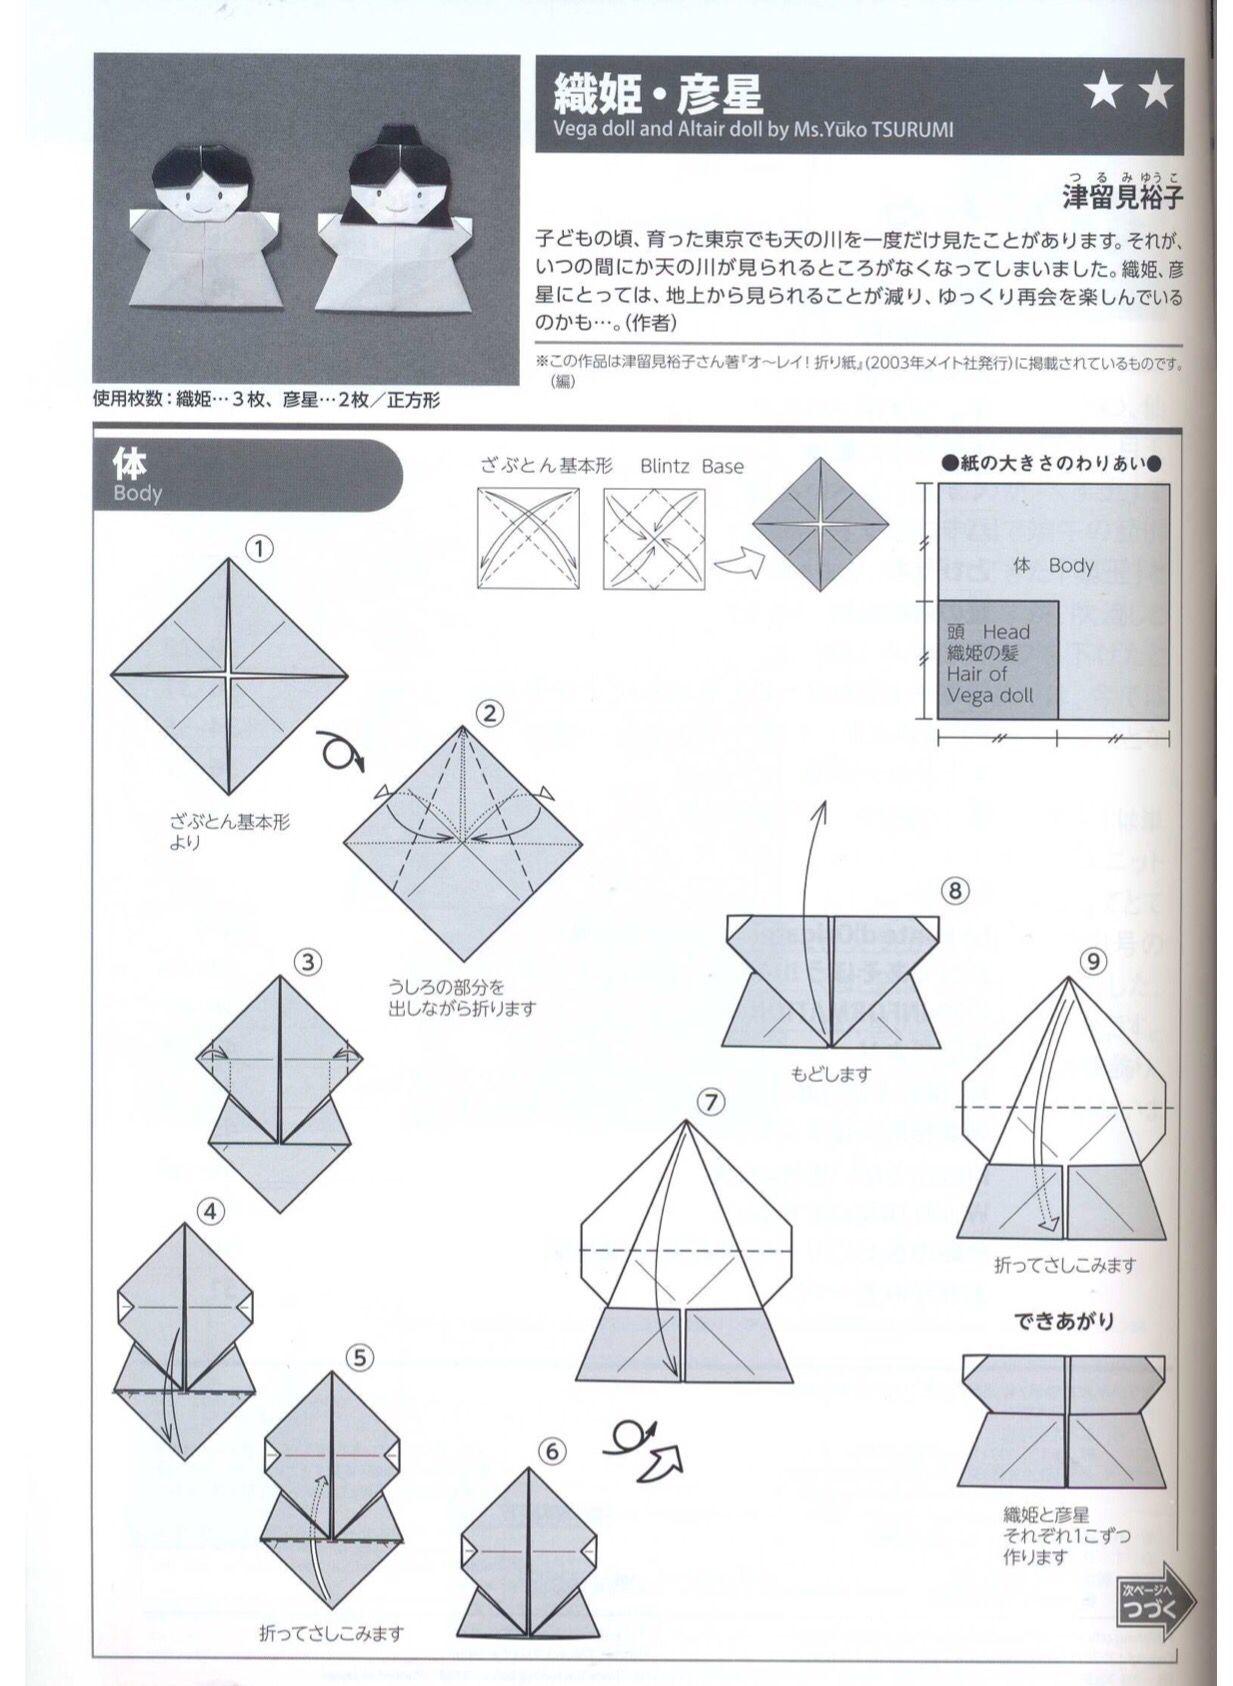 Origami vega doll 1 ori ori pinterest origami dolls and origami vega doll 1 pooptronica